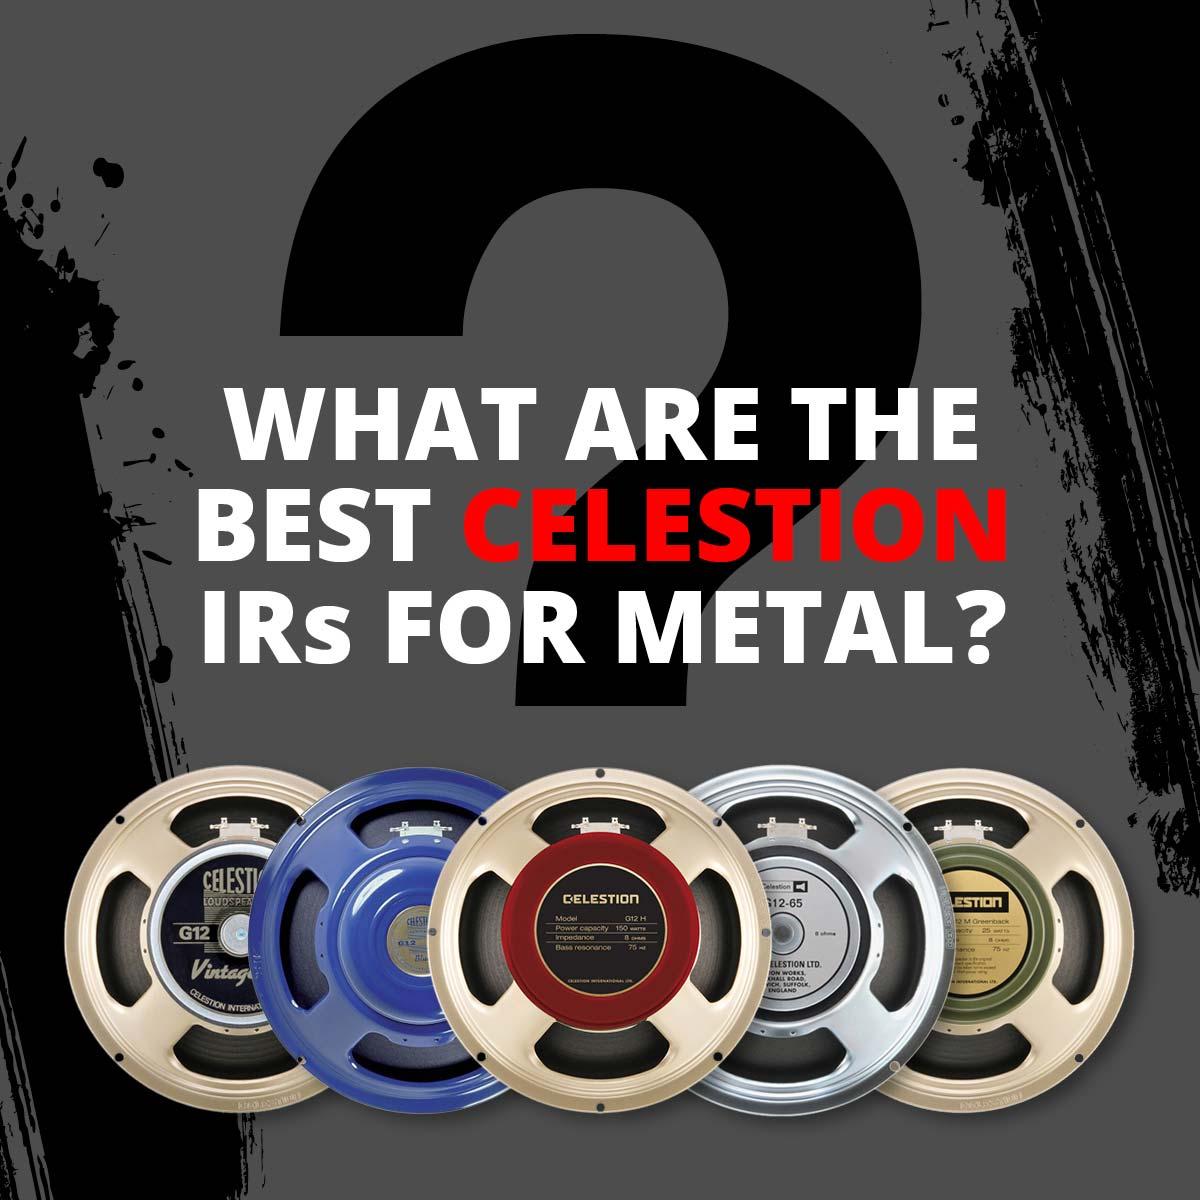 Celestion IRs, metal